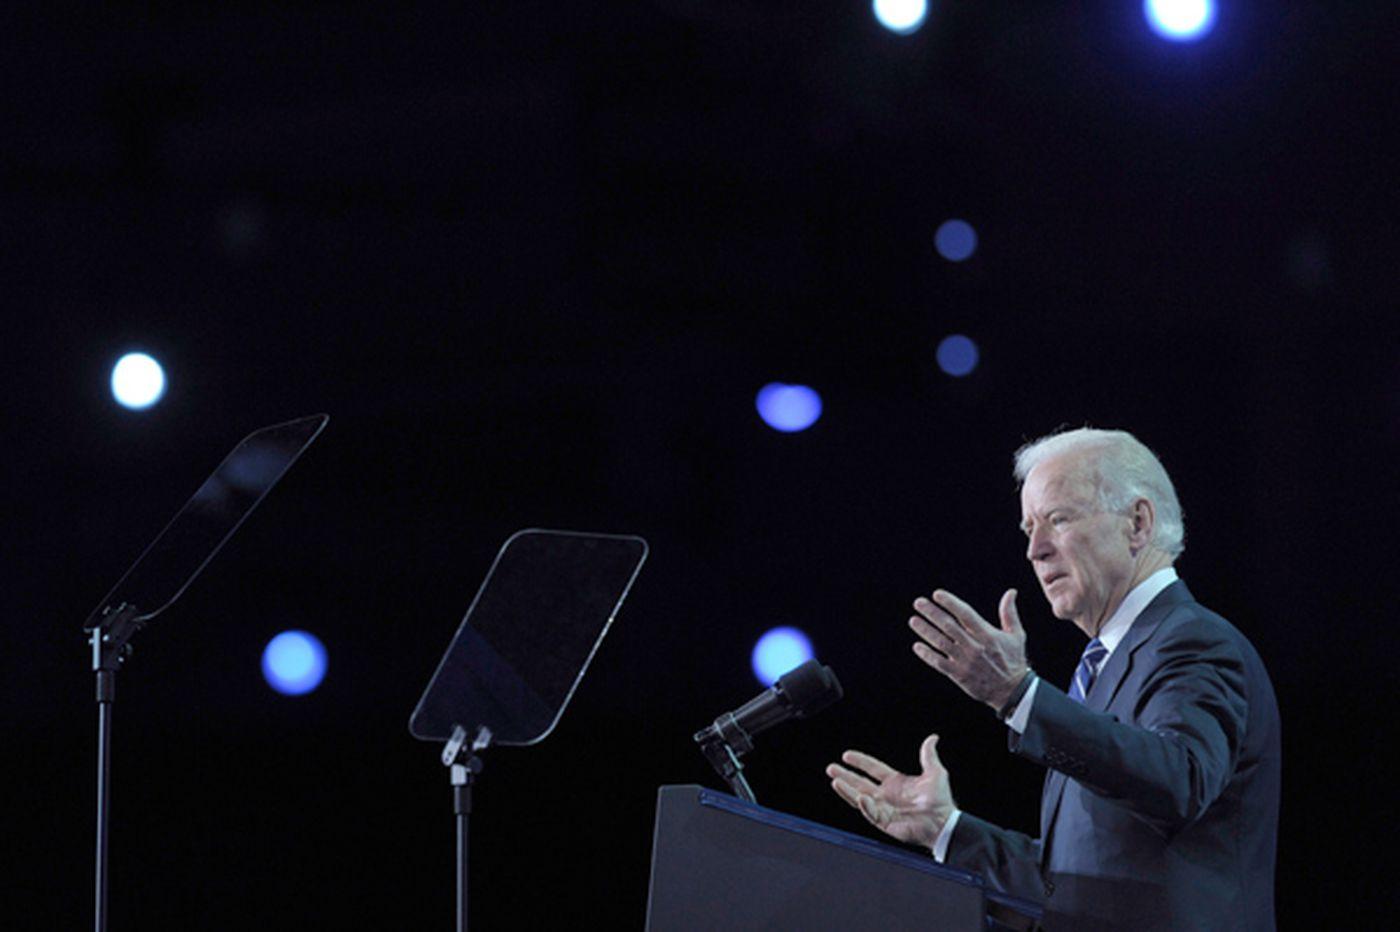 Factcheck: Biden's gun check 'good old days' never happened